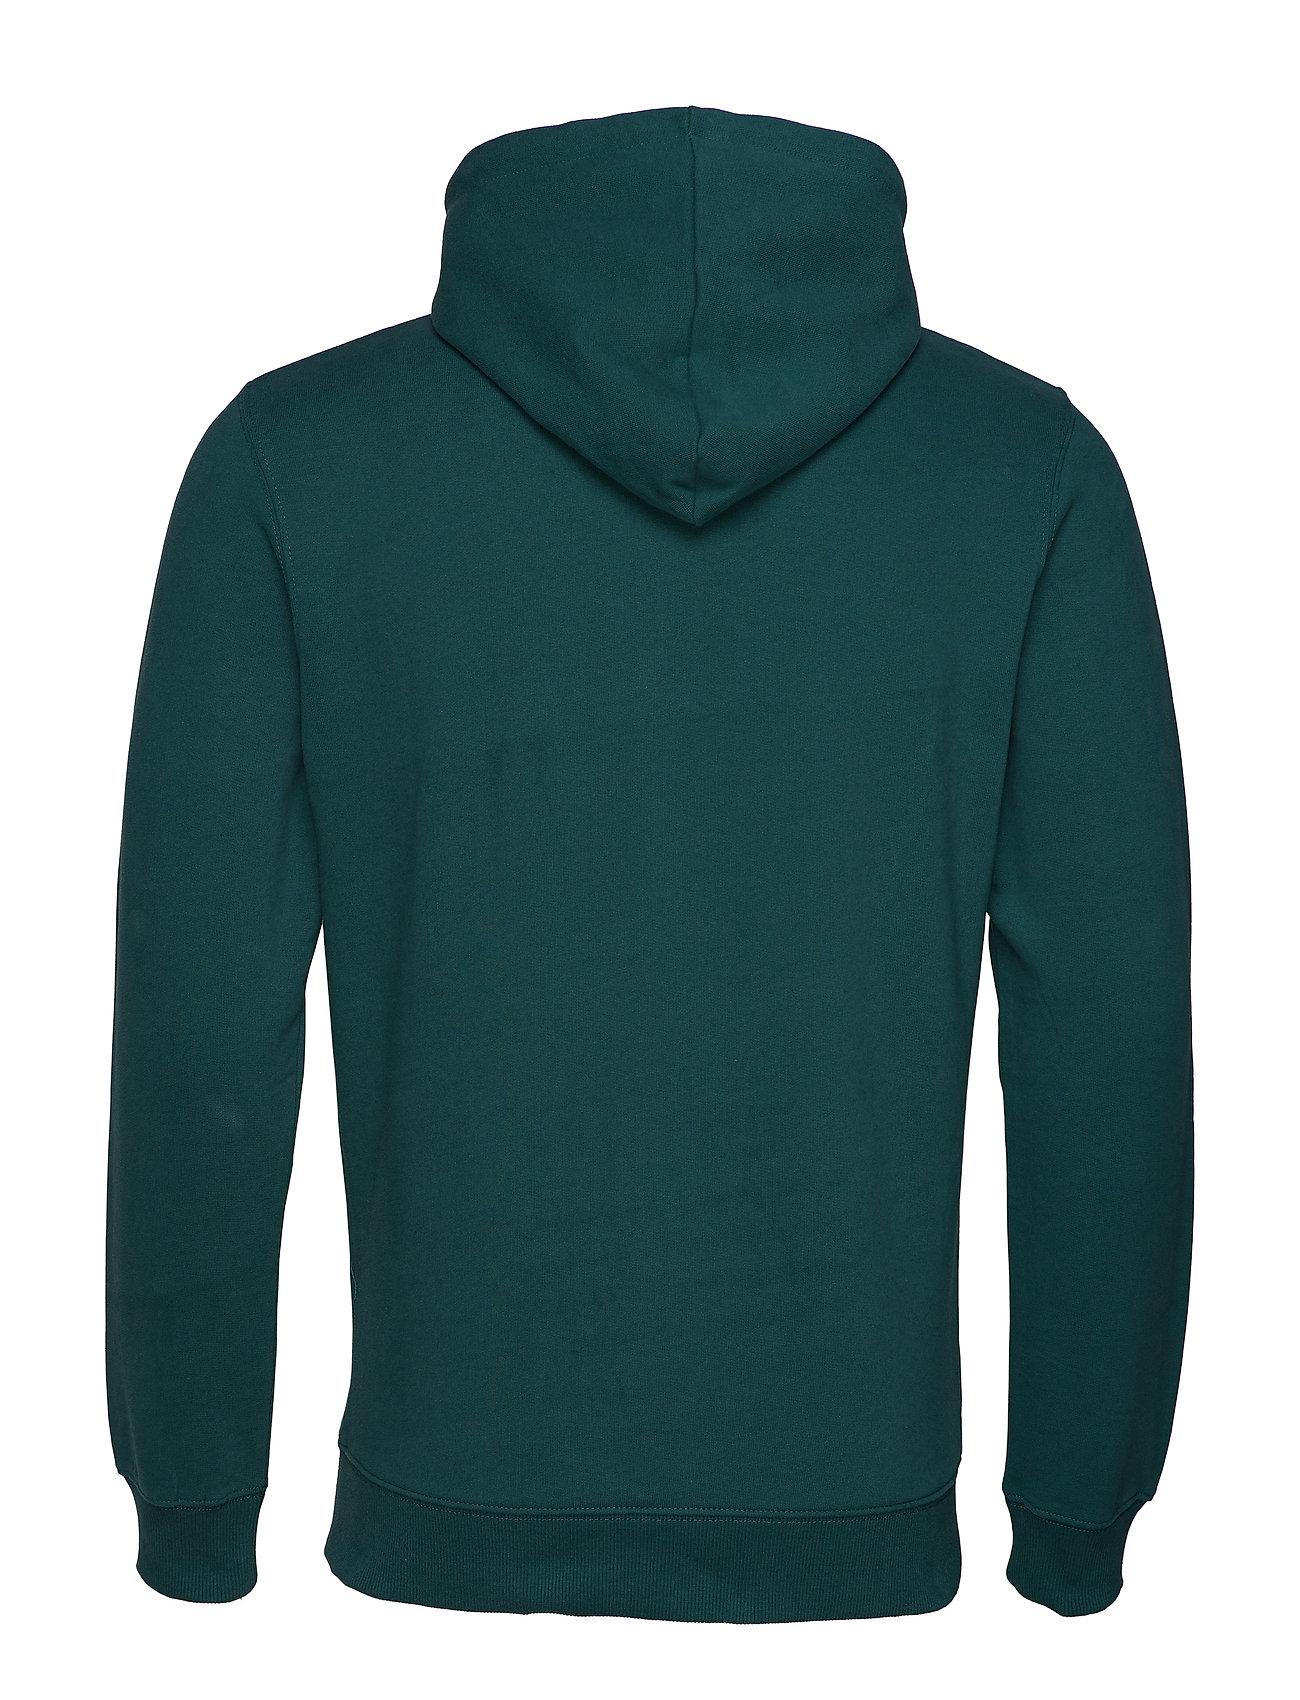 Hood Sweat Apparel With Logobistro GreenKnowledge Cotton Owl Zip Chest WEDebIH29Y